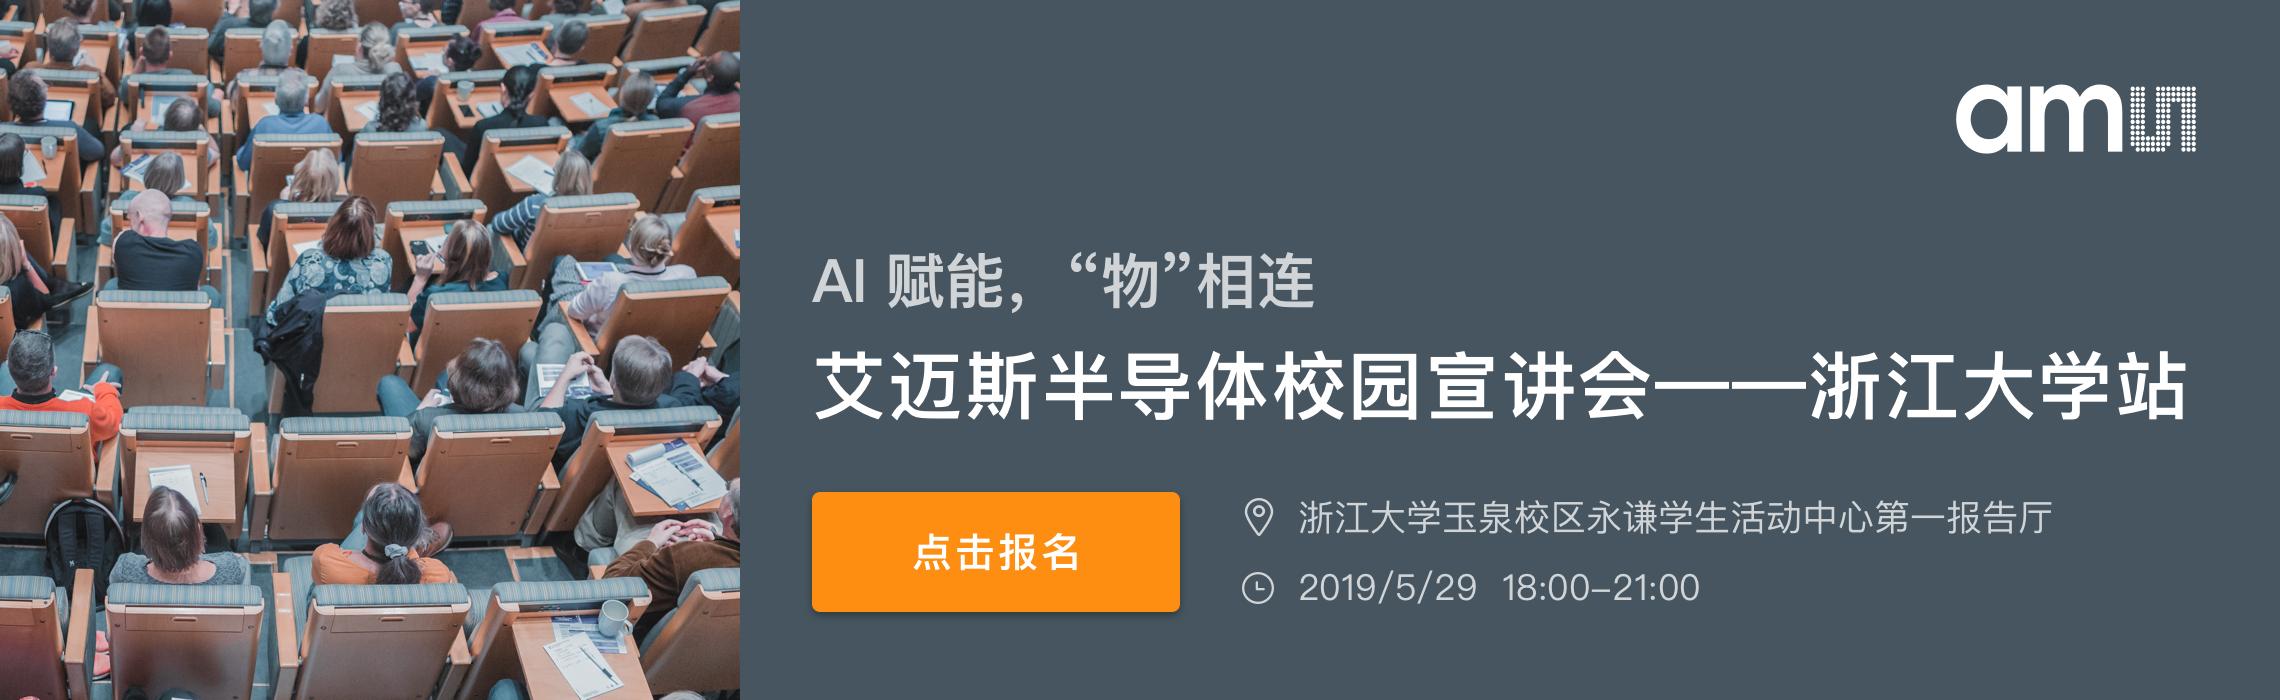 "moore8-AI赋能,""物""相连--ams在浙江大学等你!"